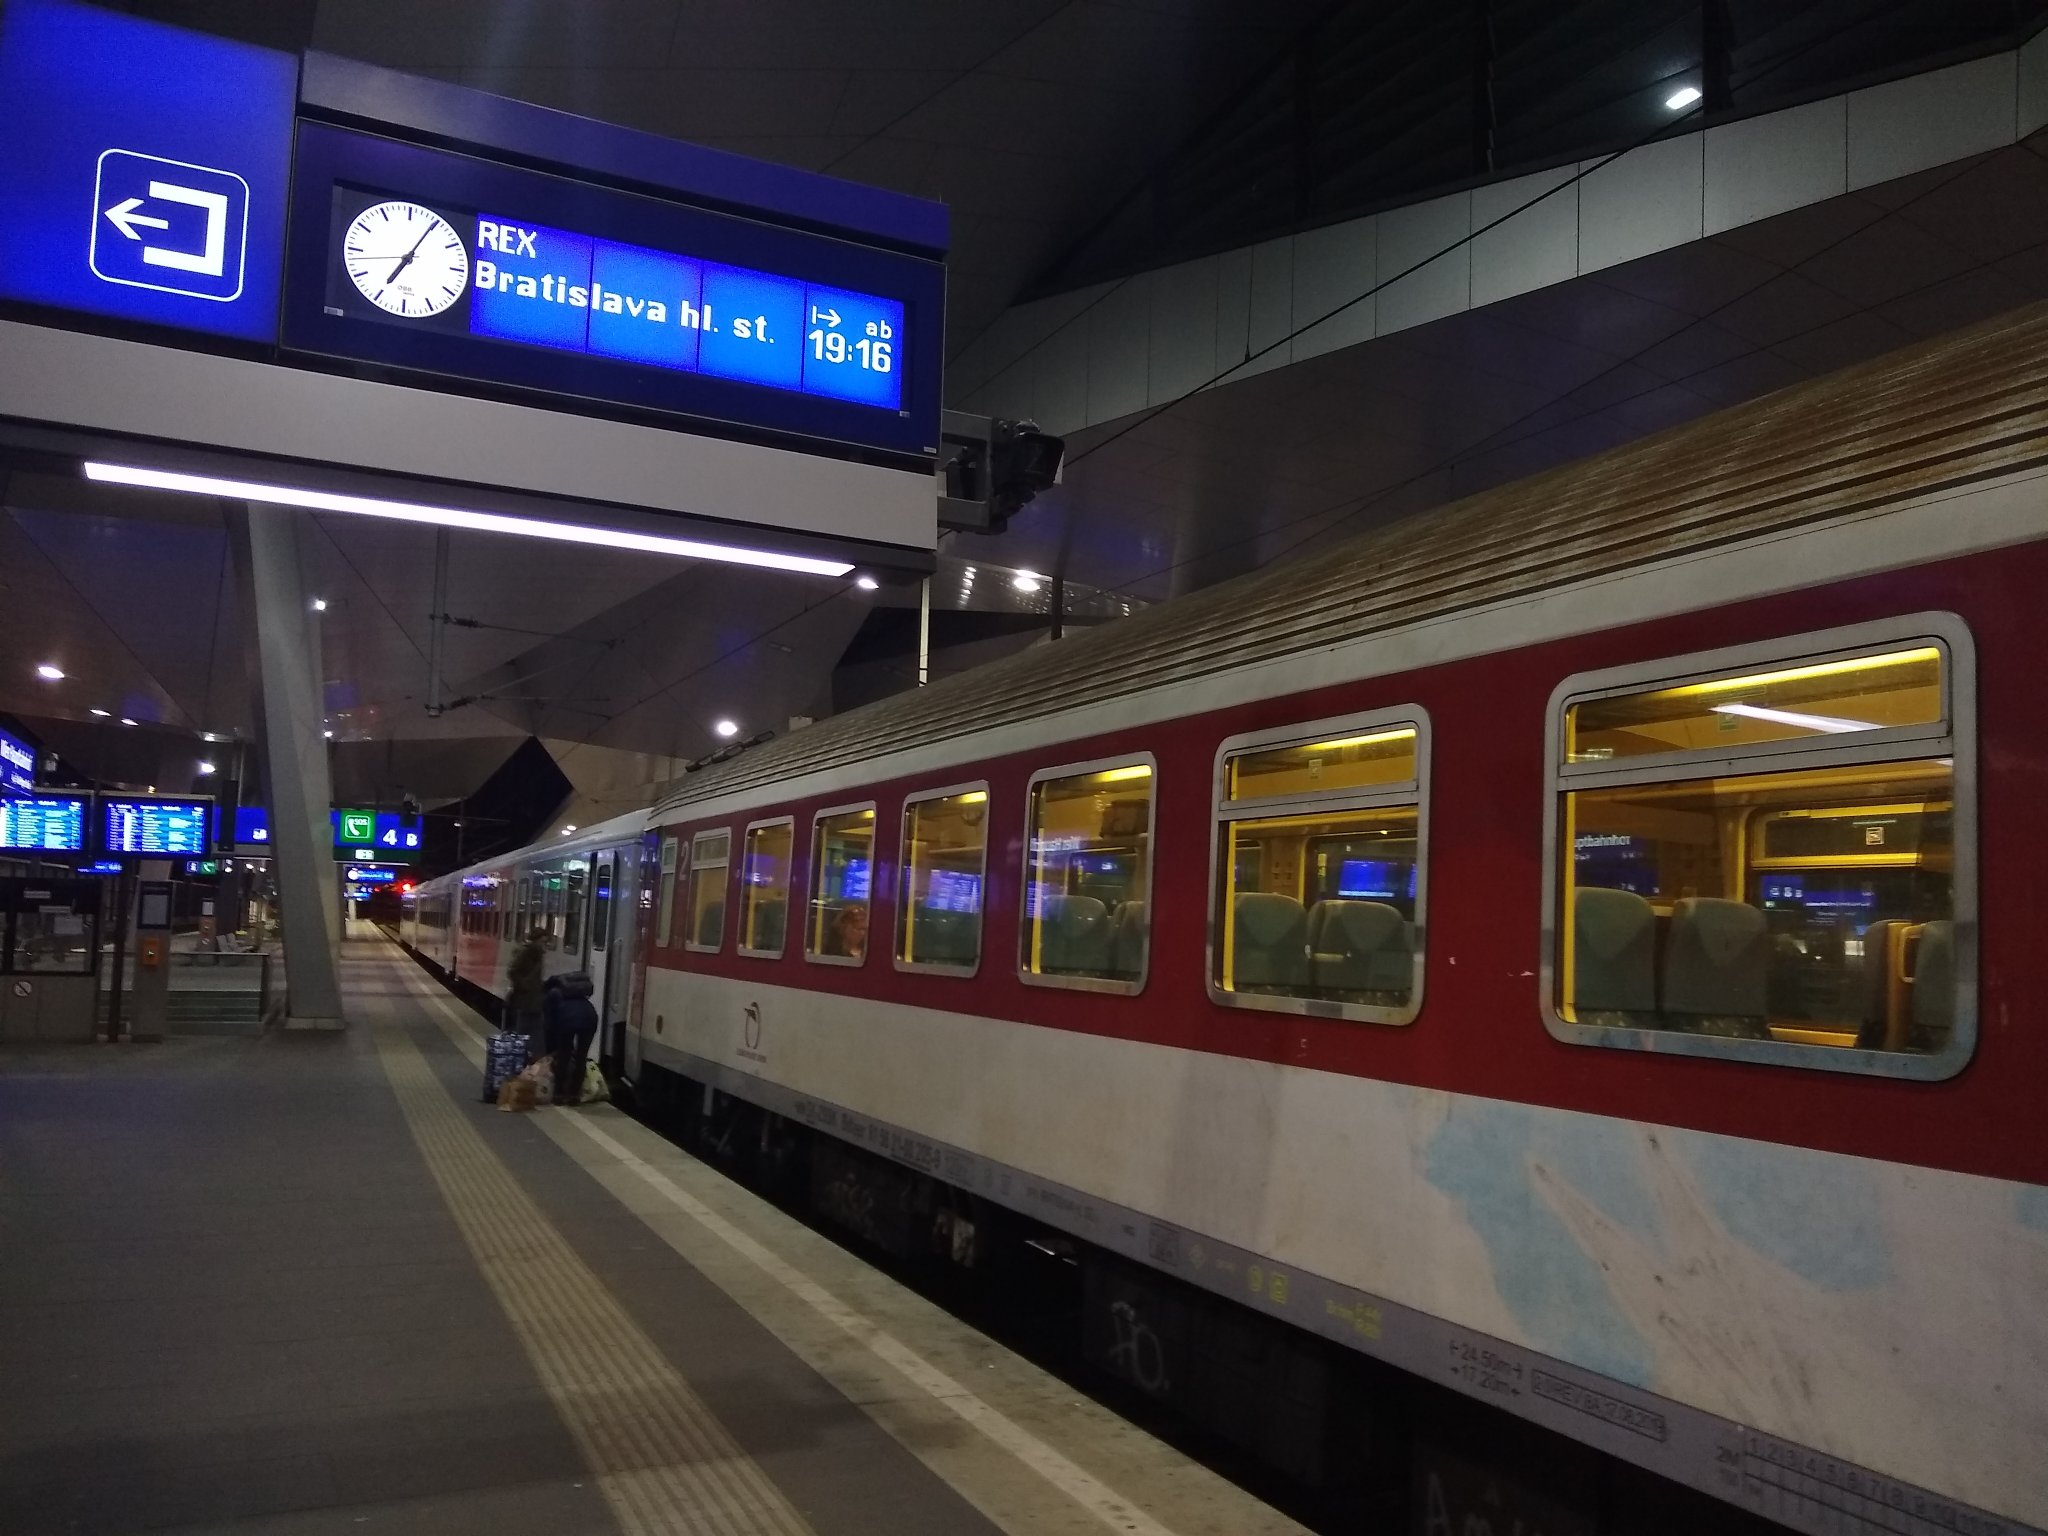 The REX to Bratislava waiting at platform 4